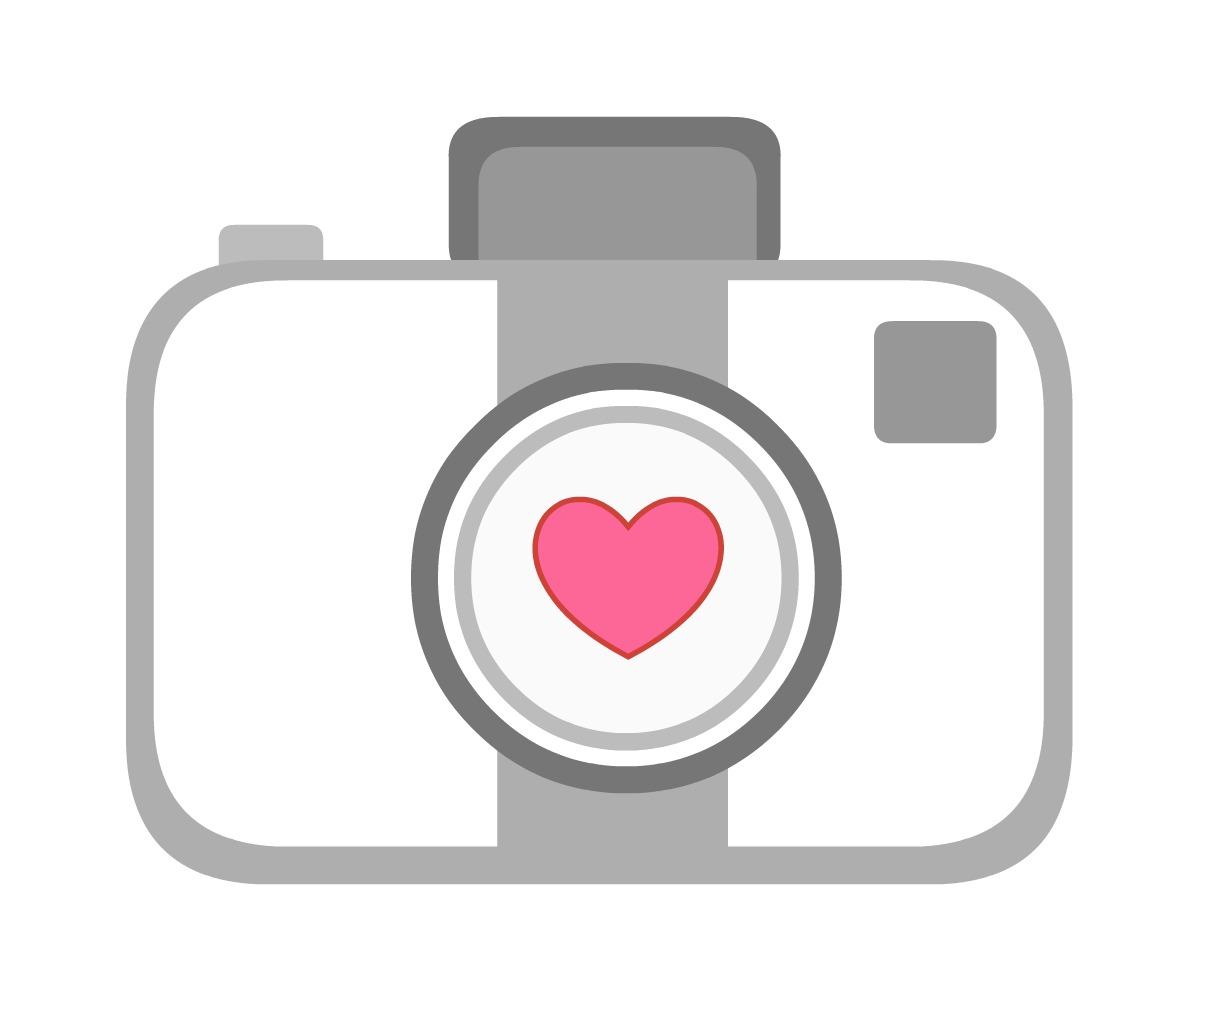 1215x1022 Cute Camera Clipart Danaami2 Top 2